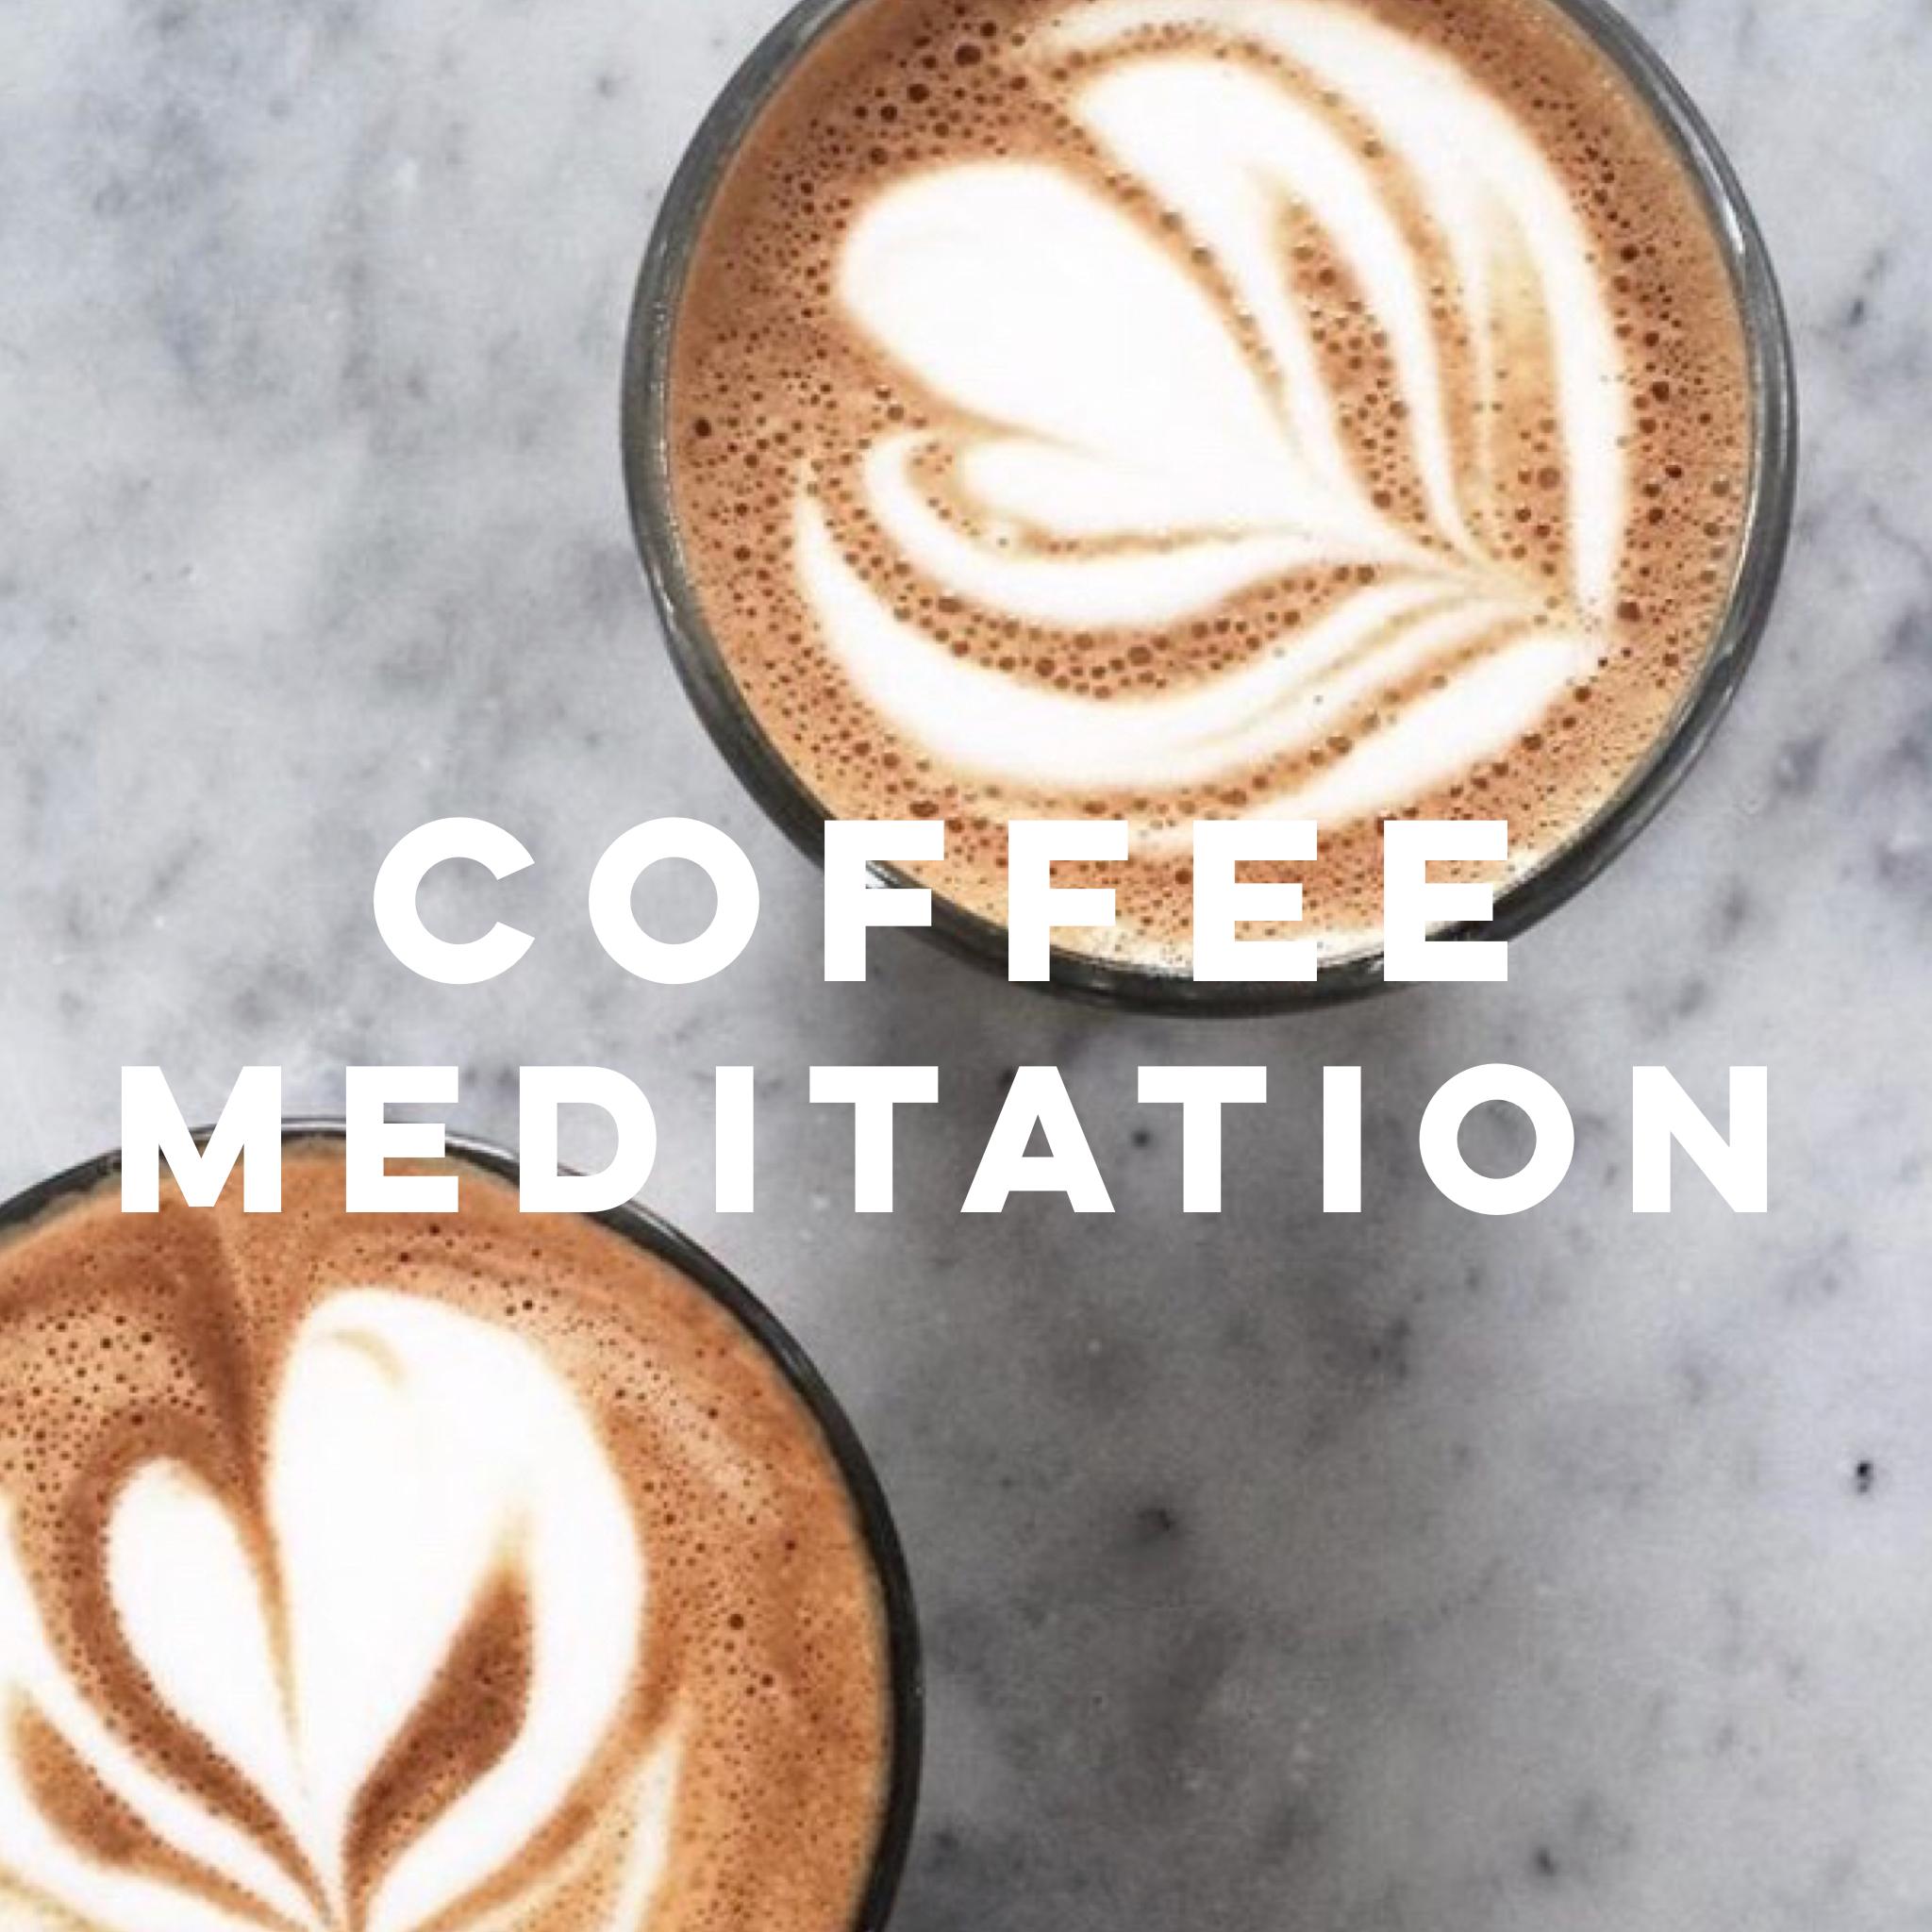 coffeemeditation.jpg